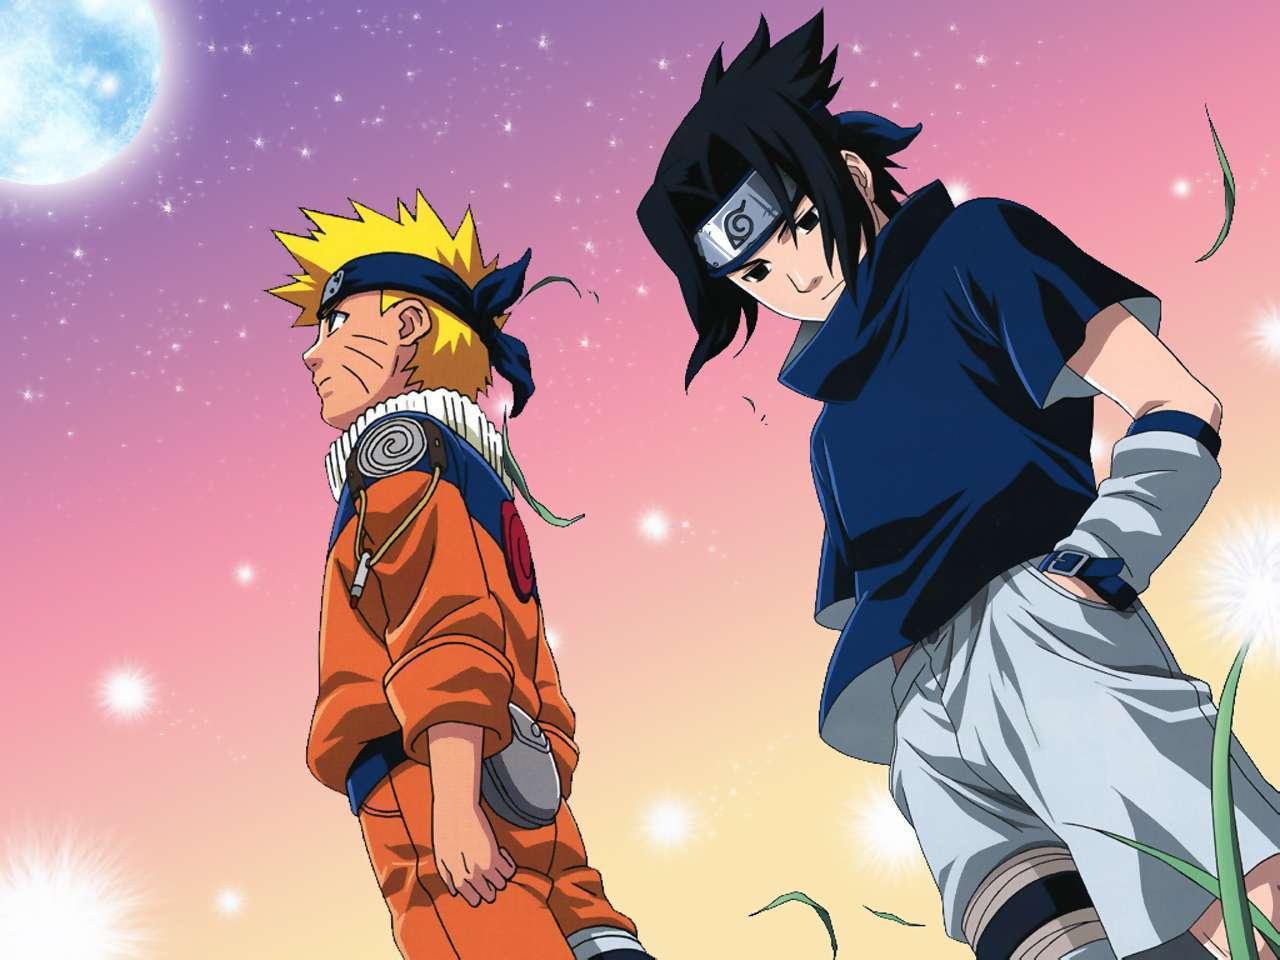 Download Wallpaper Naruto Original - Cs7xxL3nZVcHTC2h08w4TMNM7SQ-savager1358-40859206-1280-960  Gallery_248127.jpg